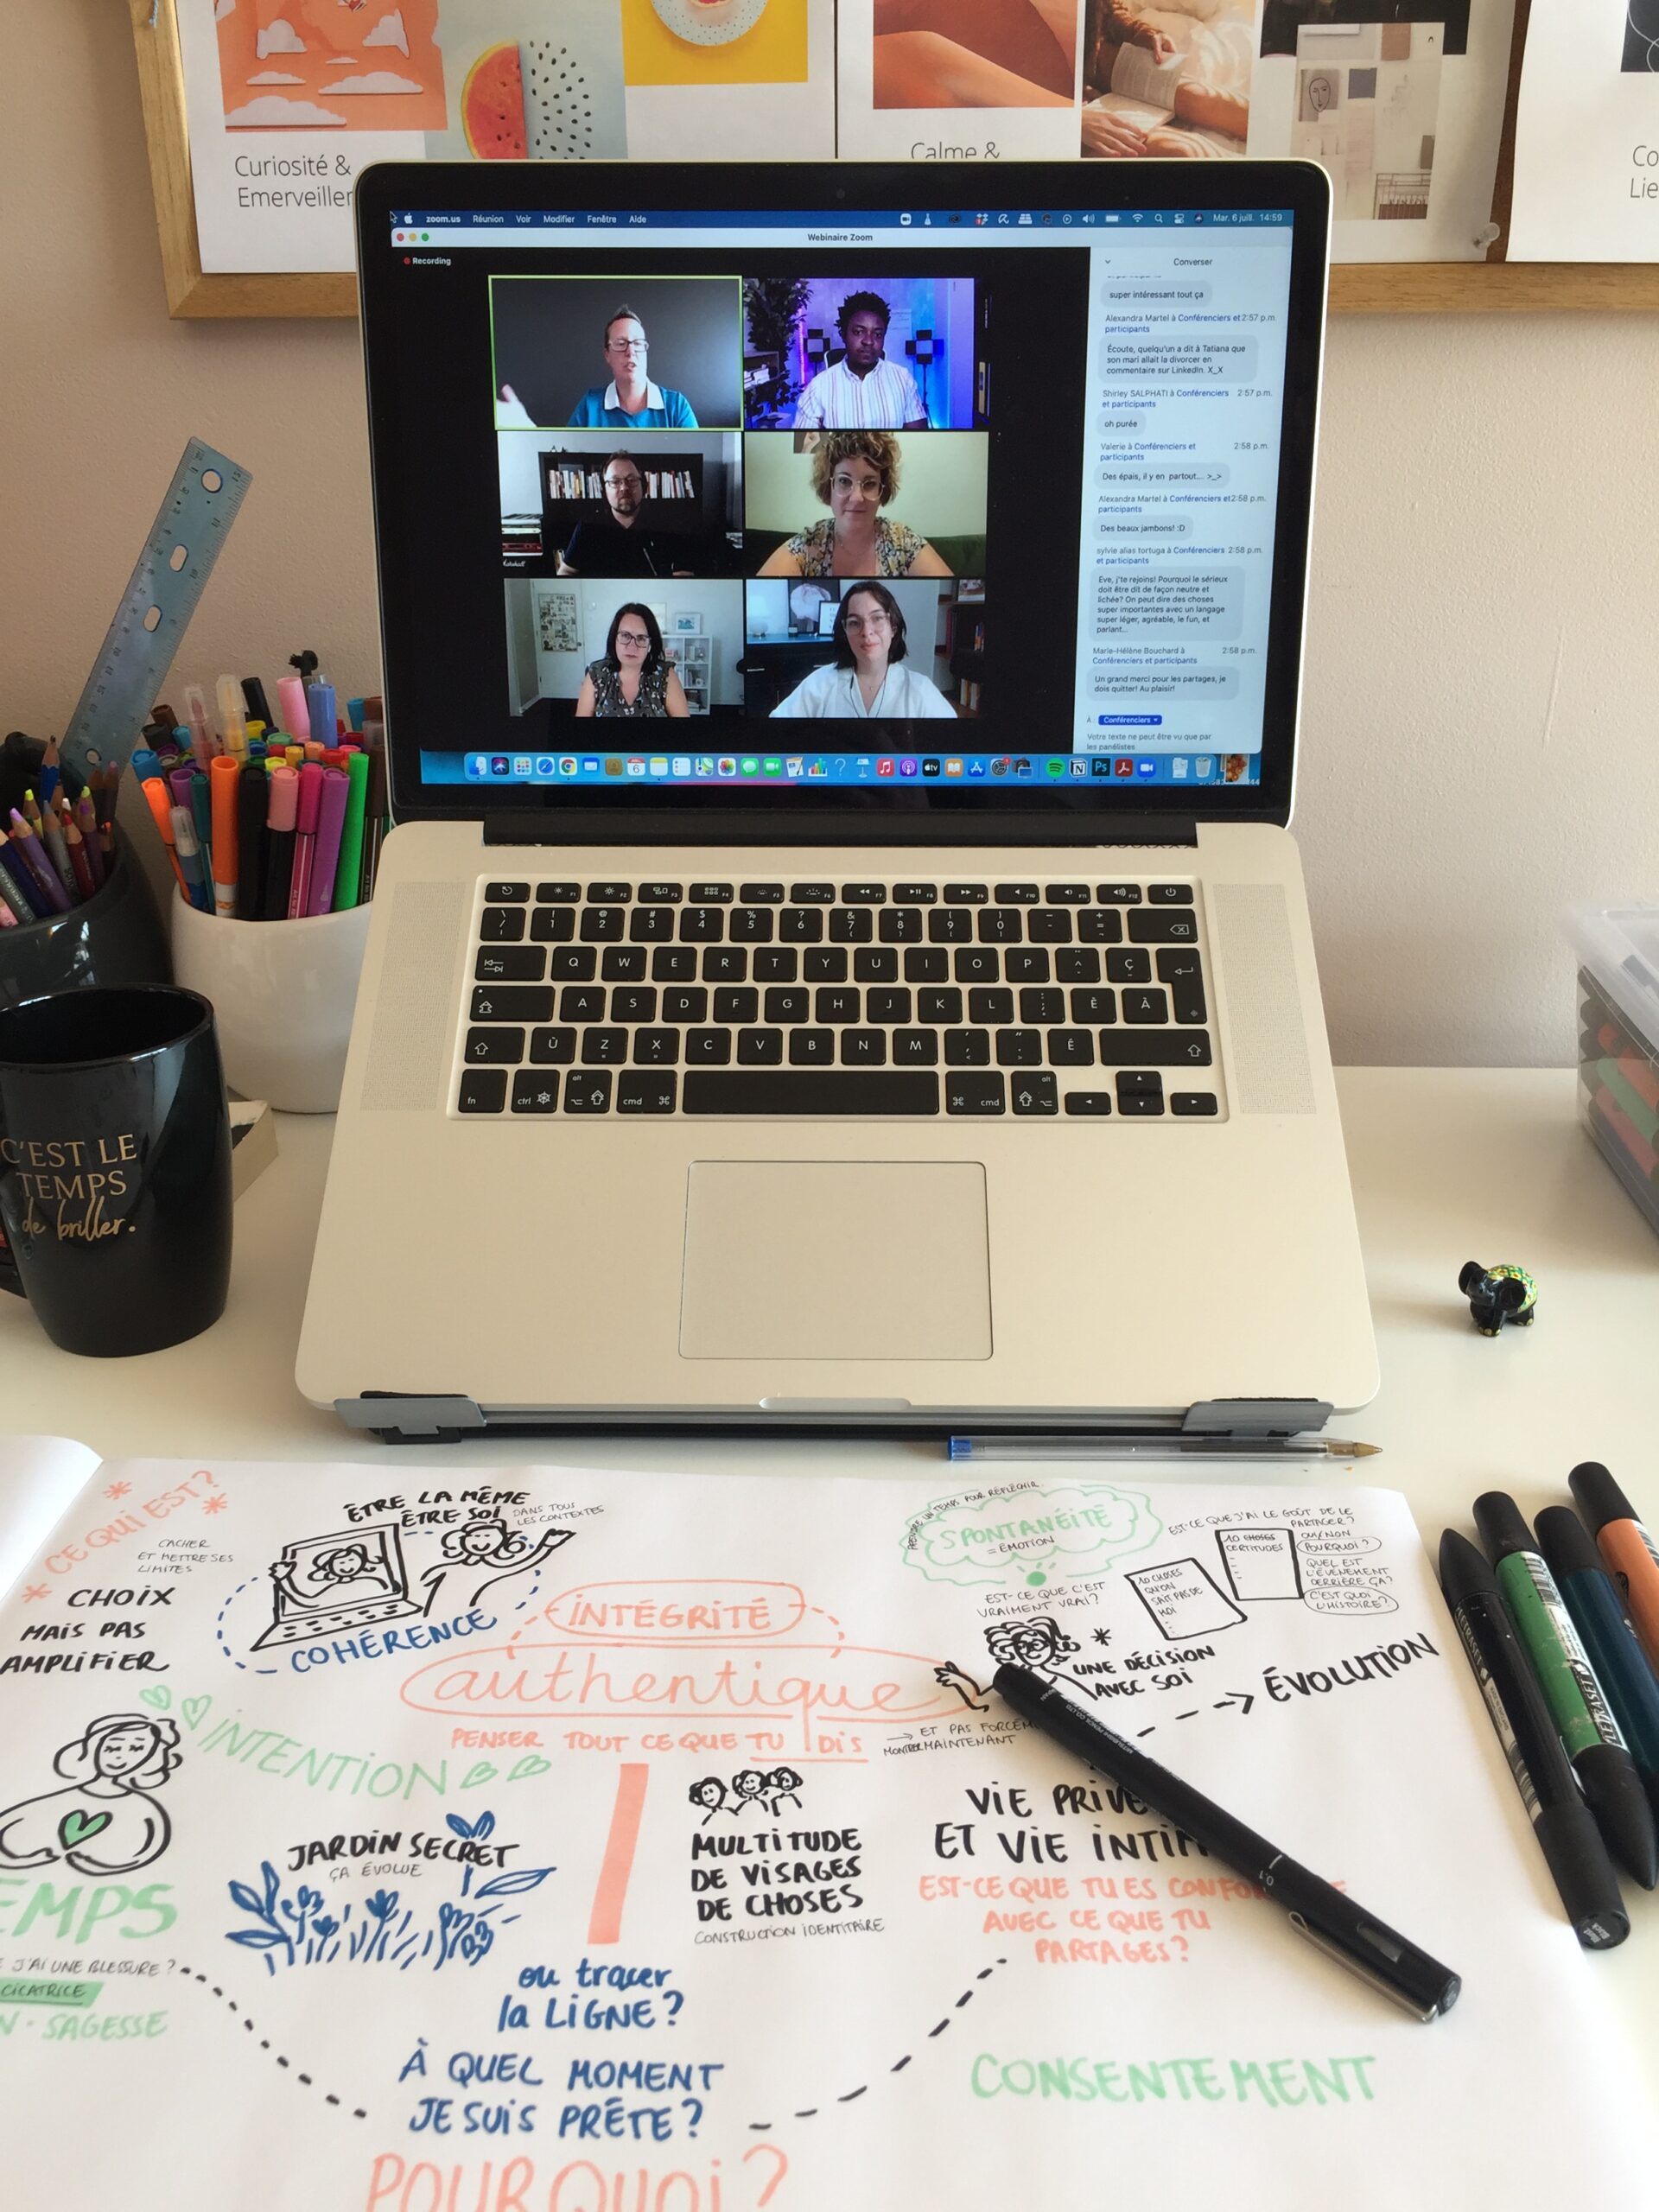 sketchnoting live